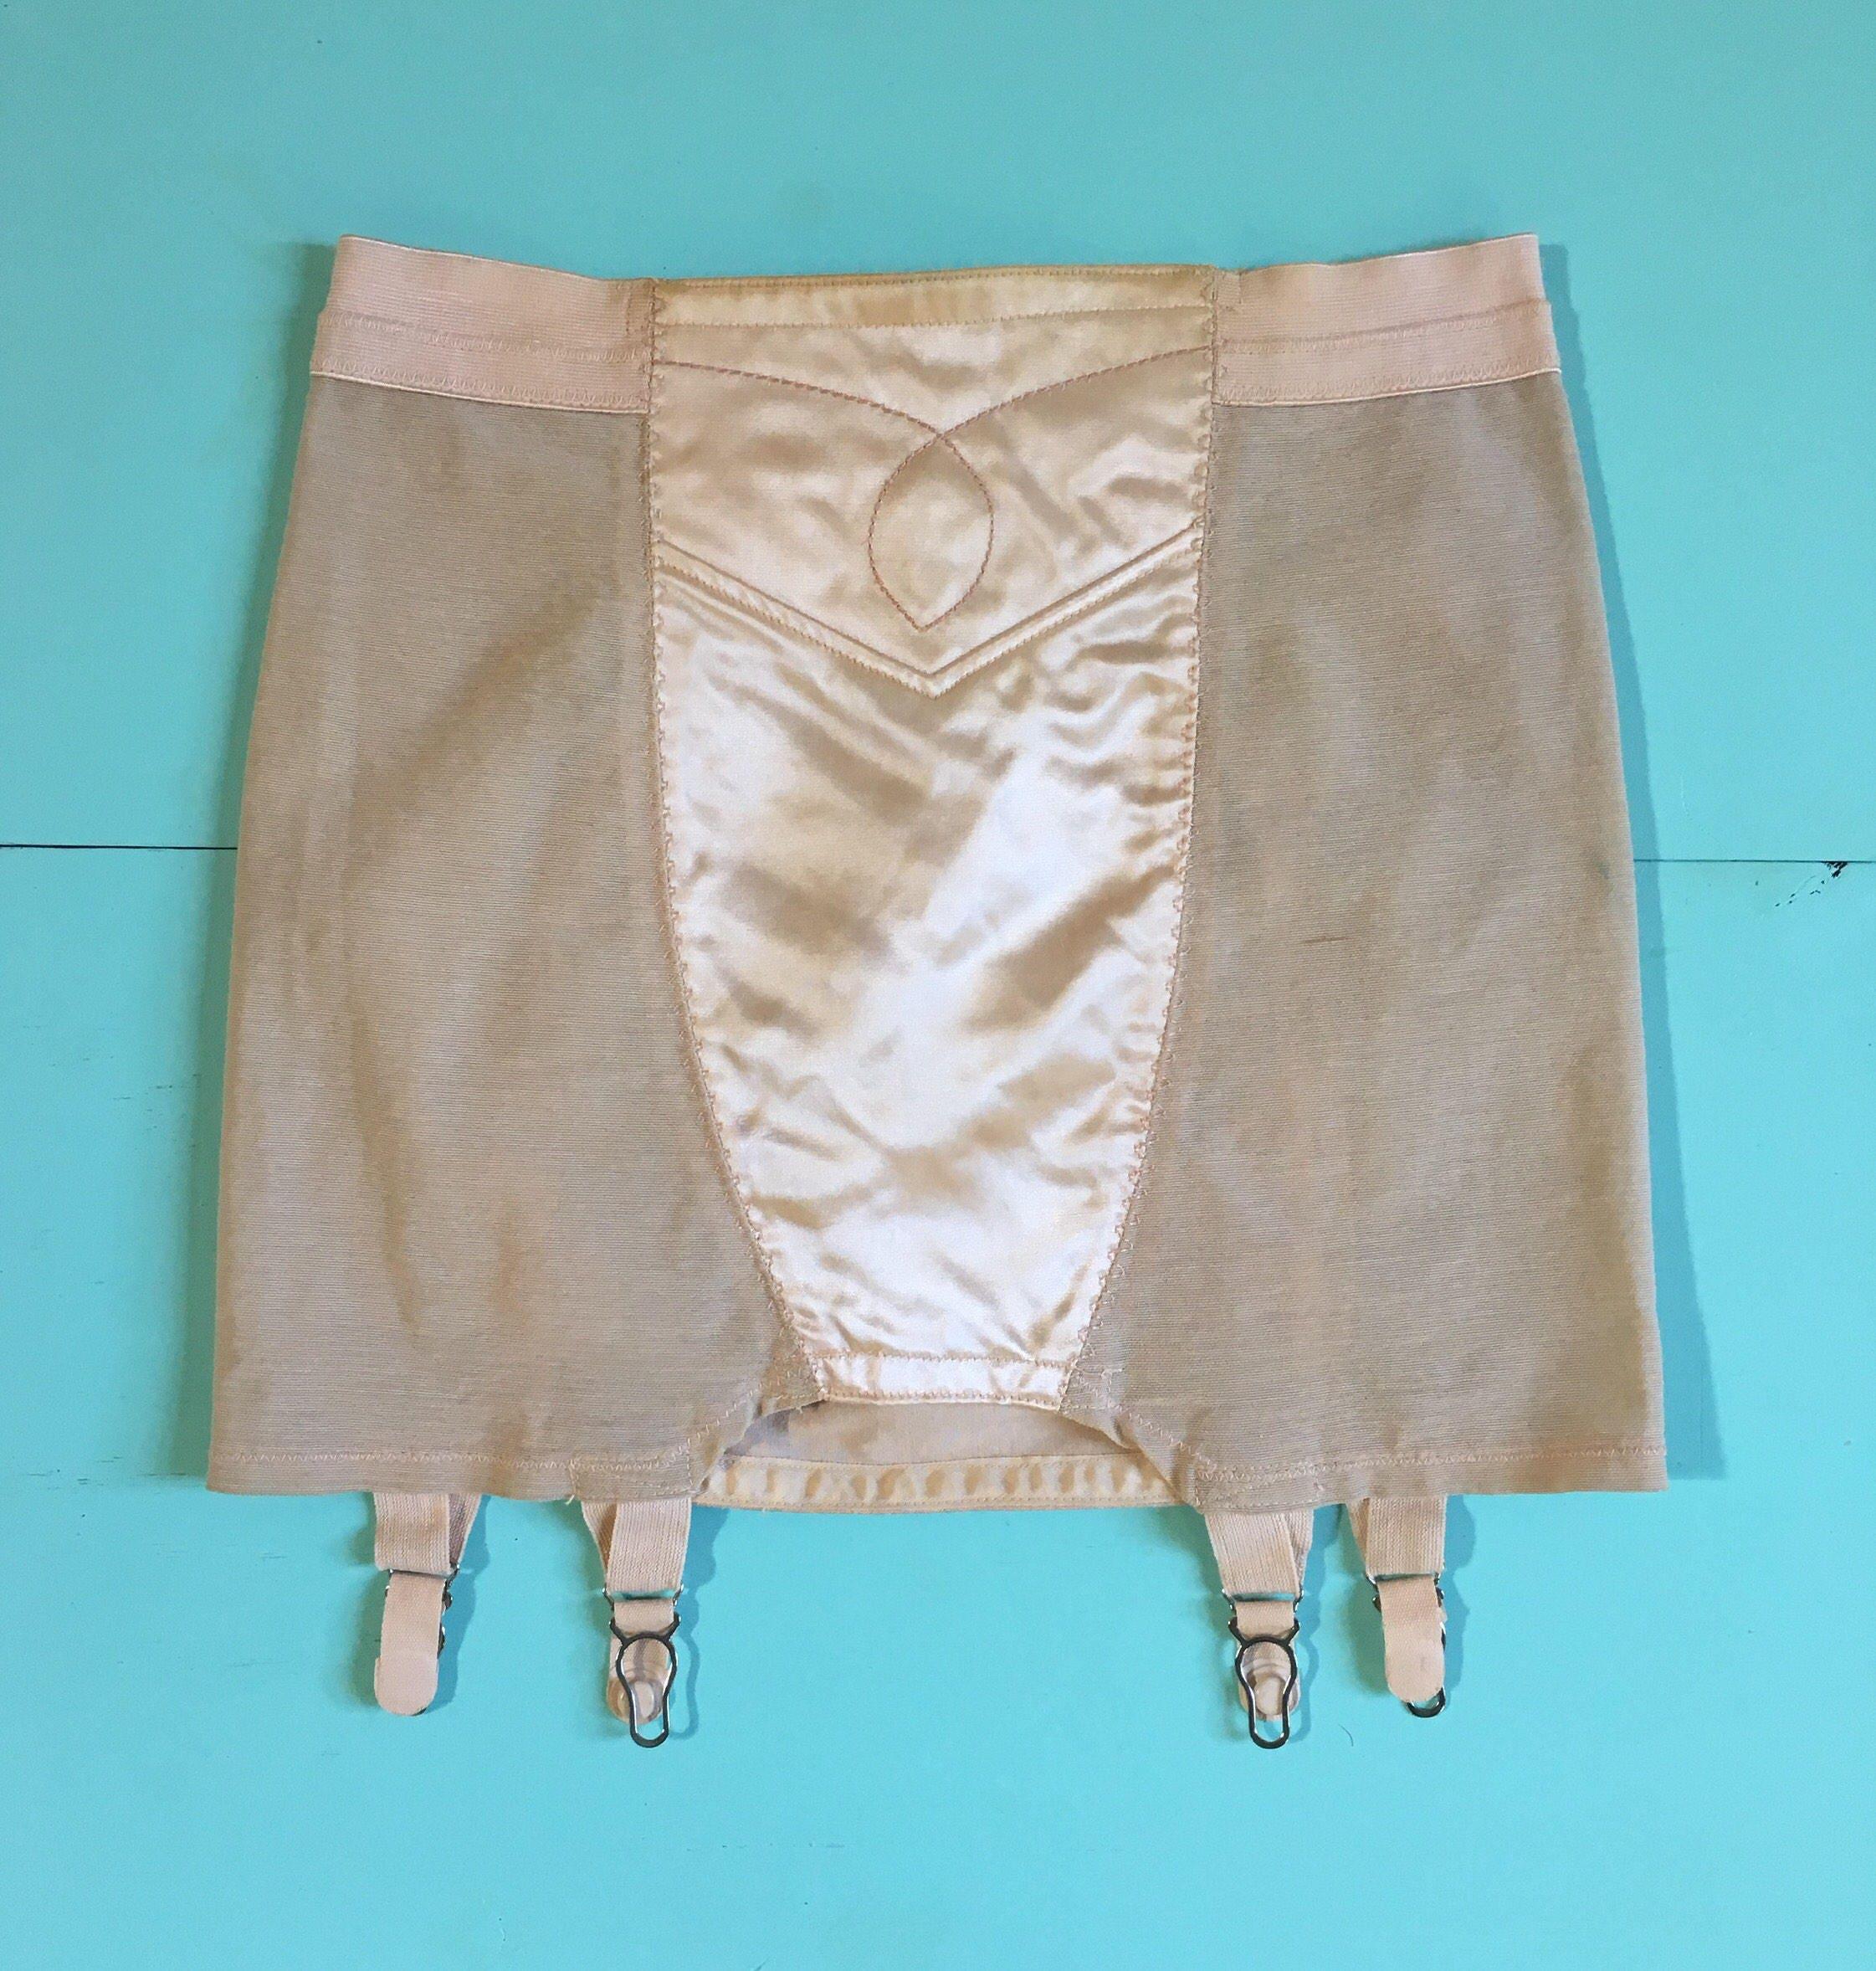 8be08a17d Vintage 1950s - pinup pink satin nylon girdle shaper waist cincher ...